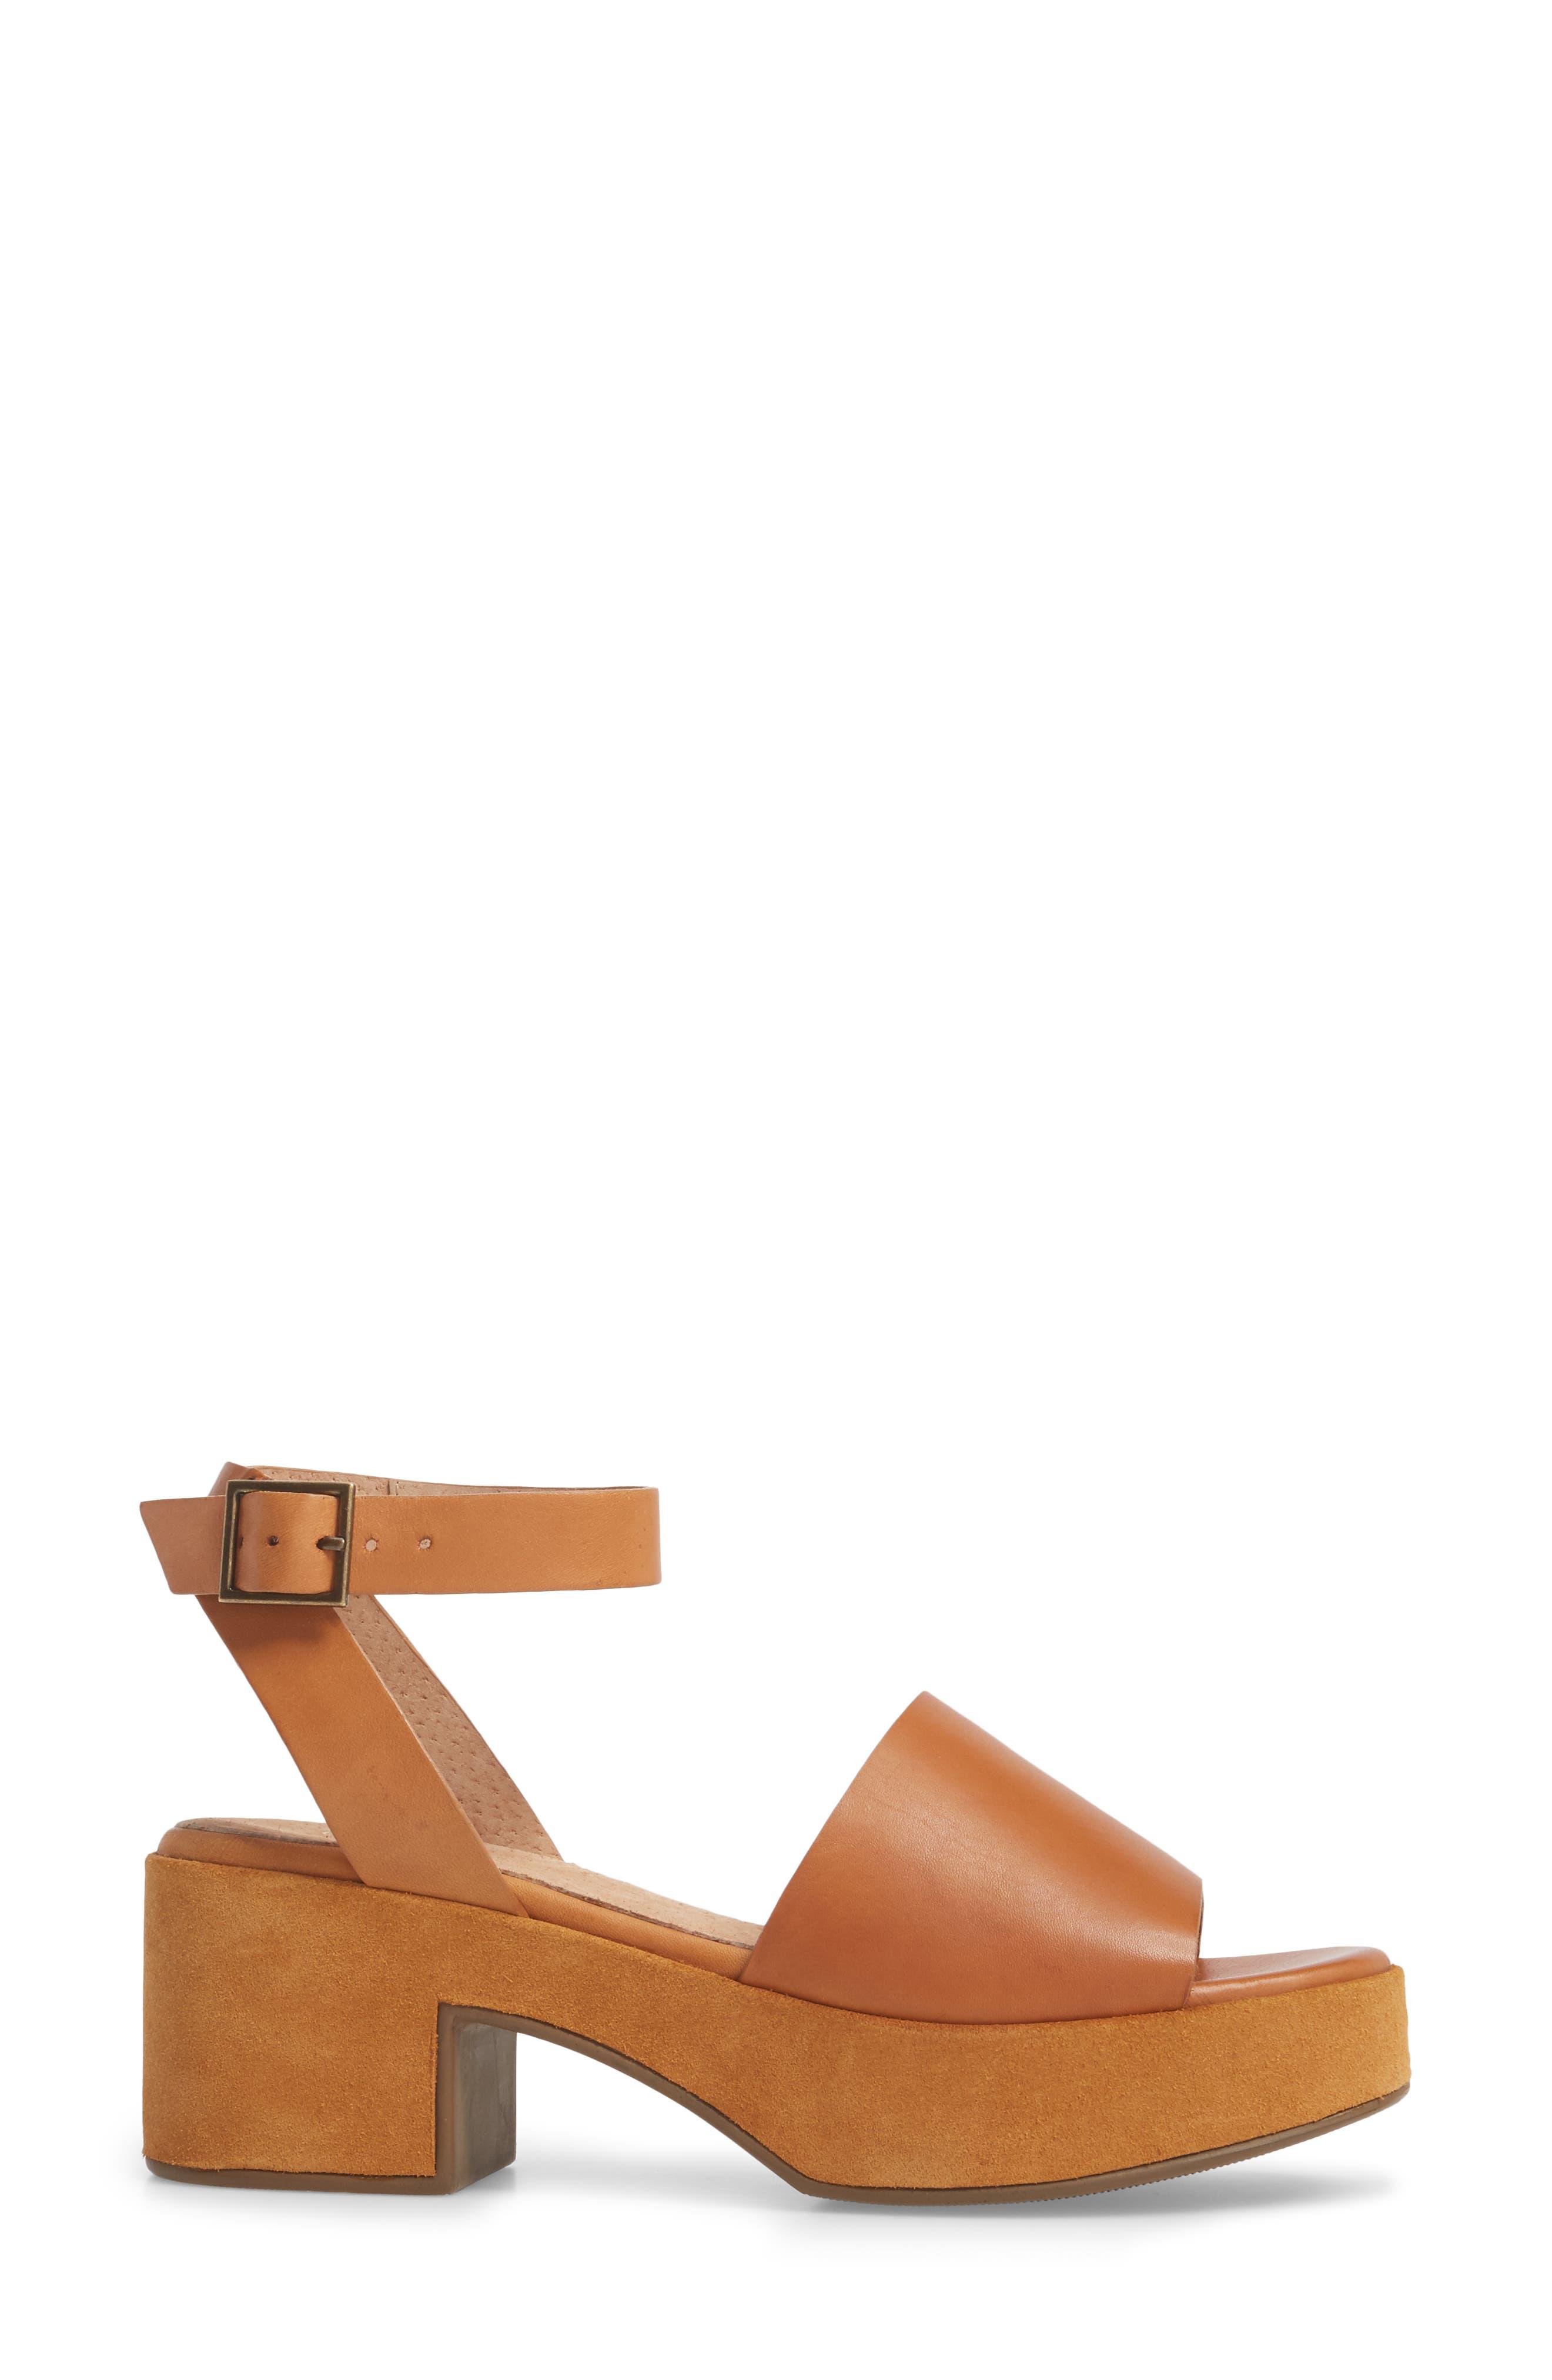 Calming Influence Platform Sandal,                             Alternate thumbnail 3, color,                             Tan Leather